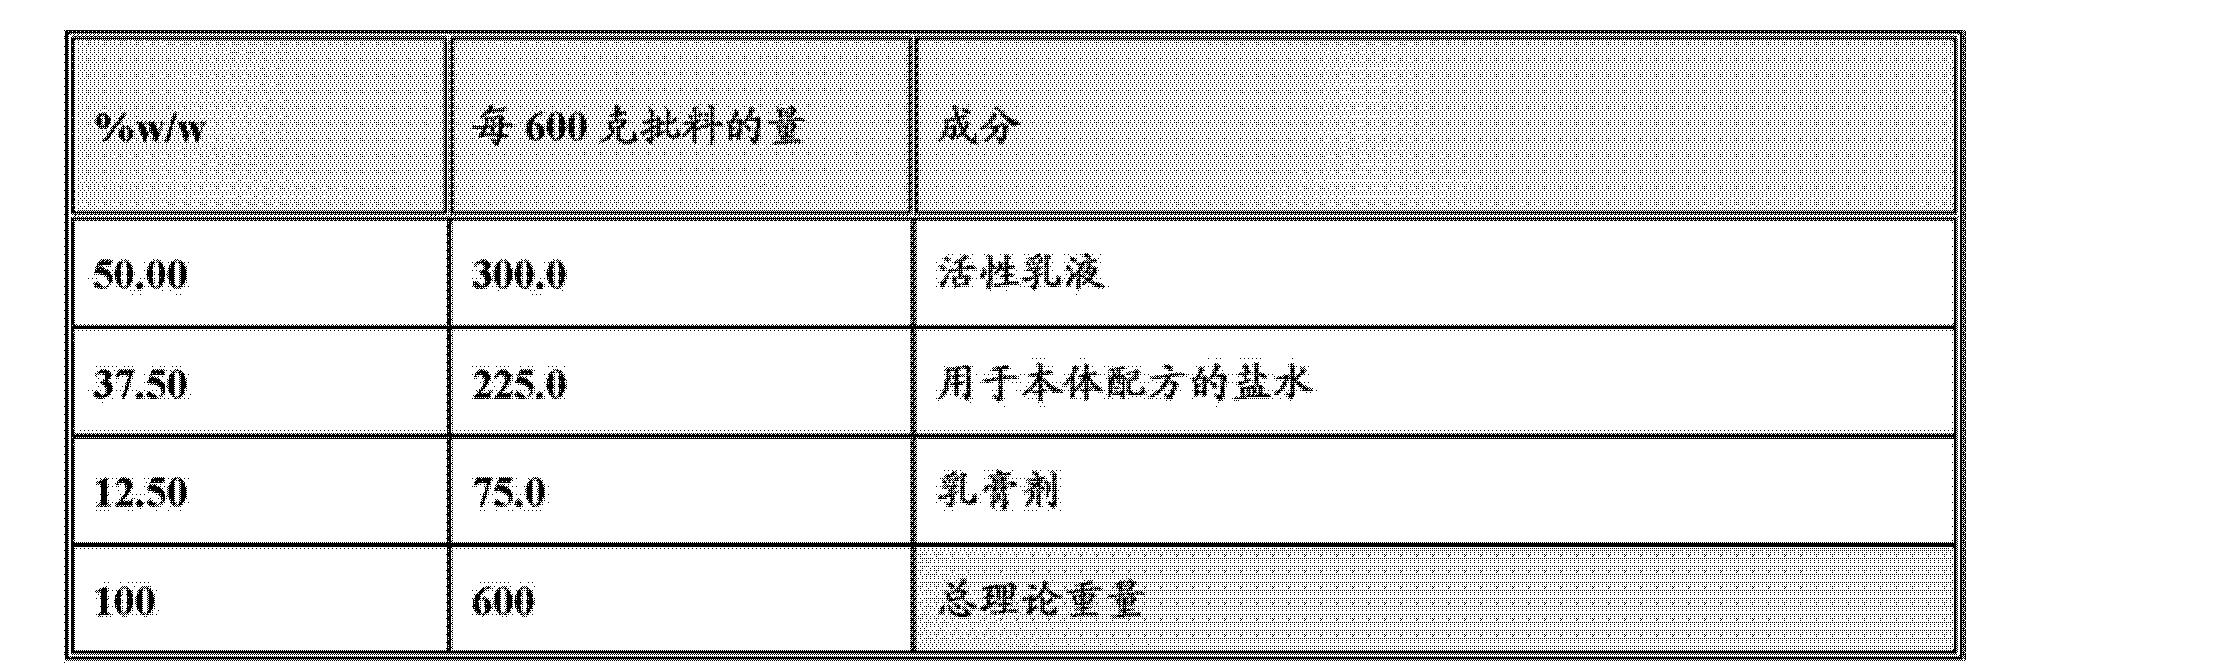 Figure CN103747782AD00983